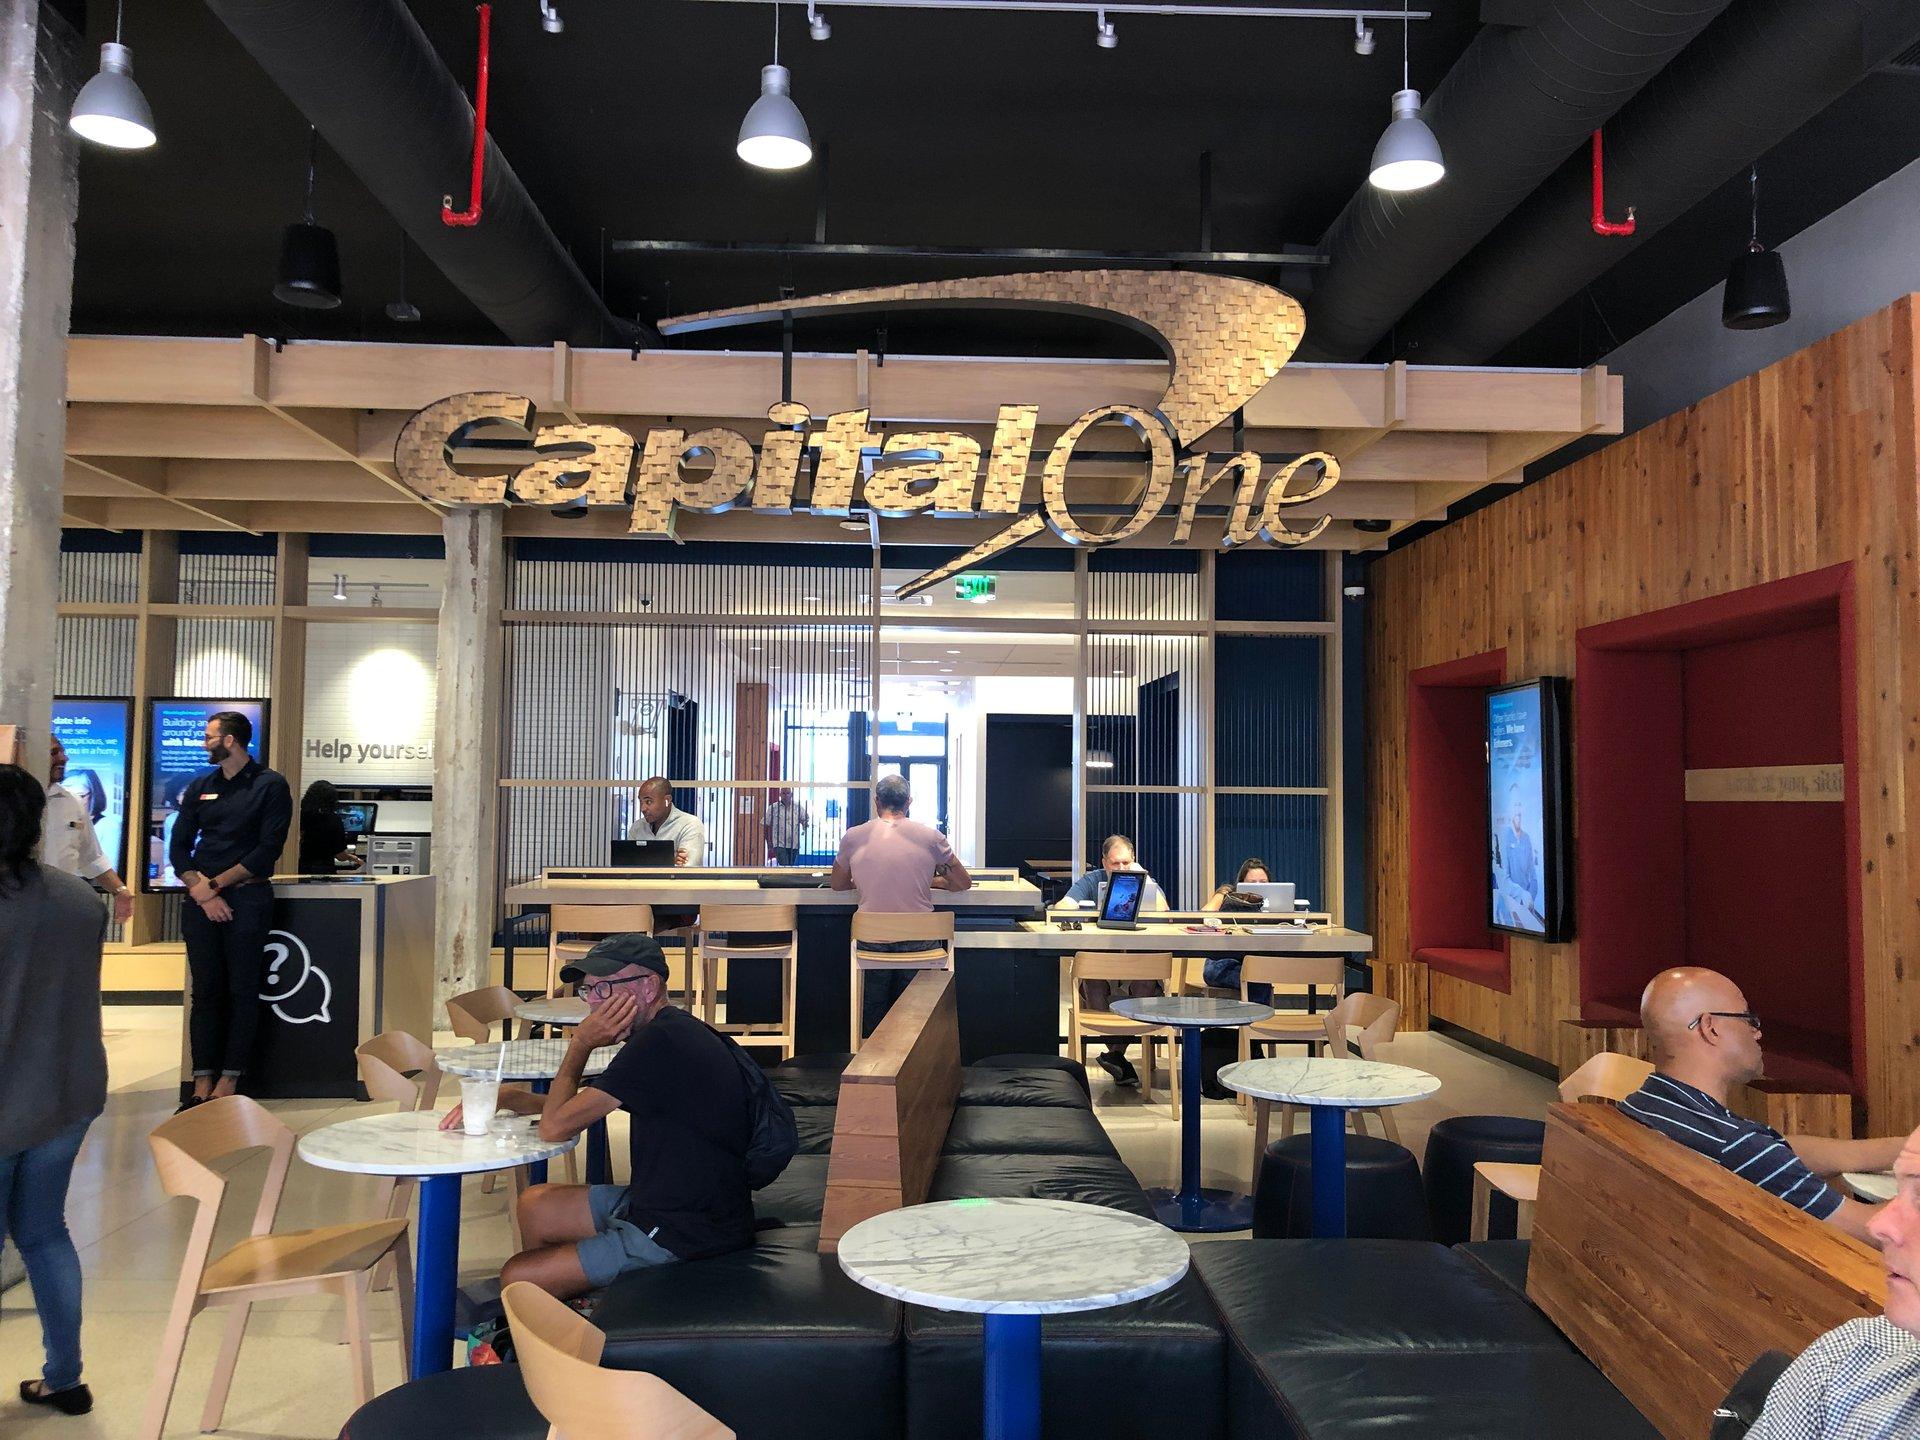 CapitalOne bank interior